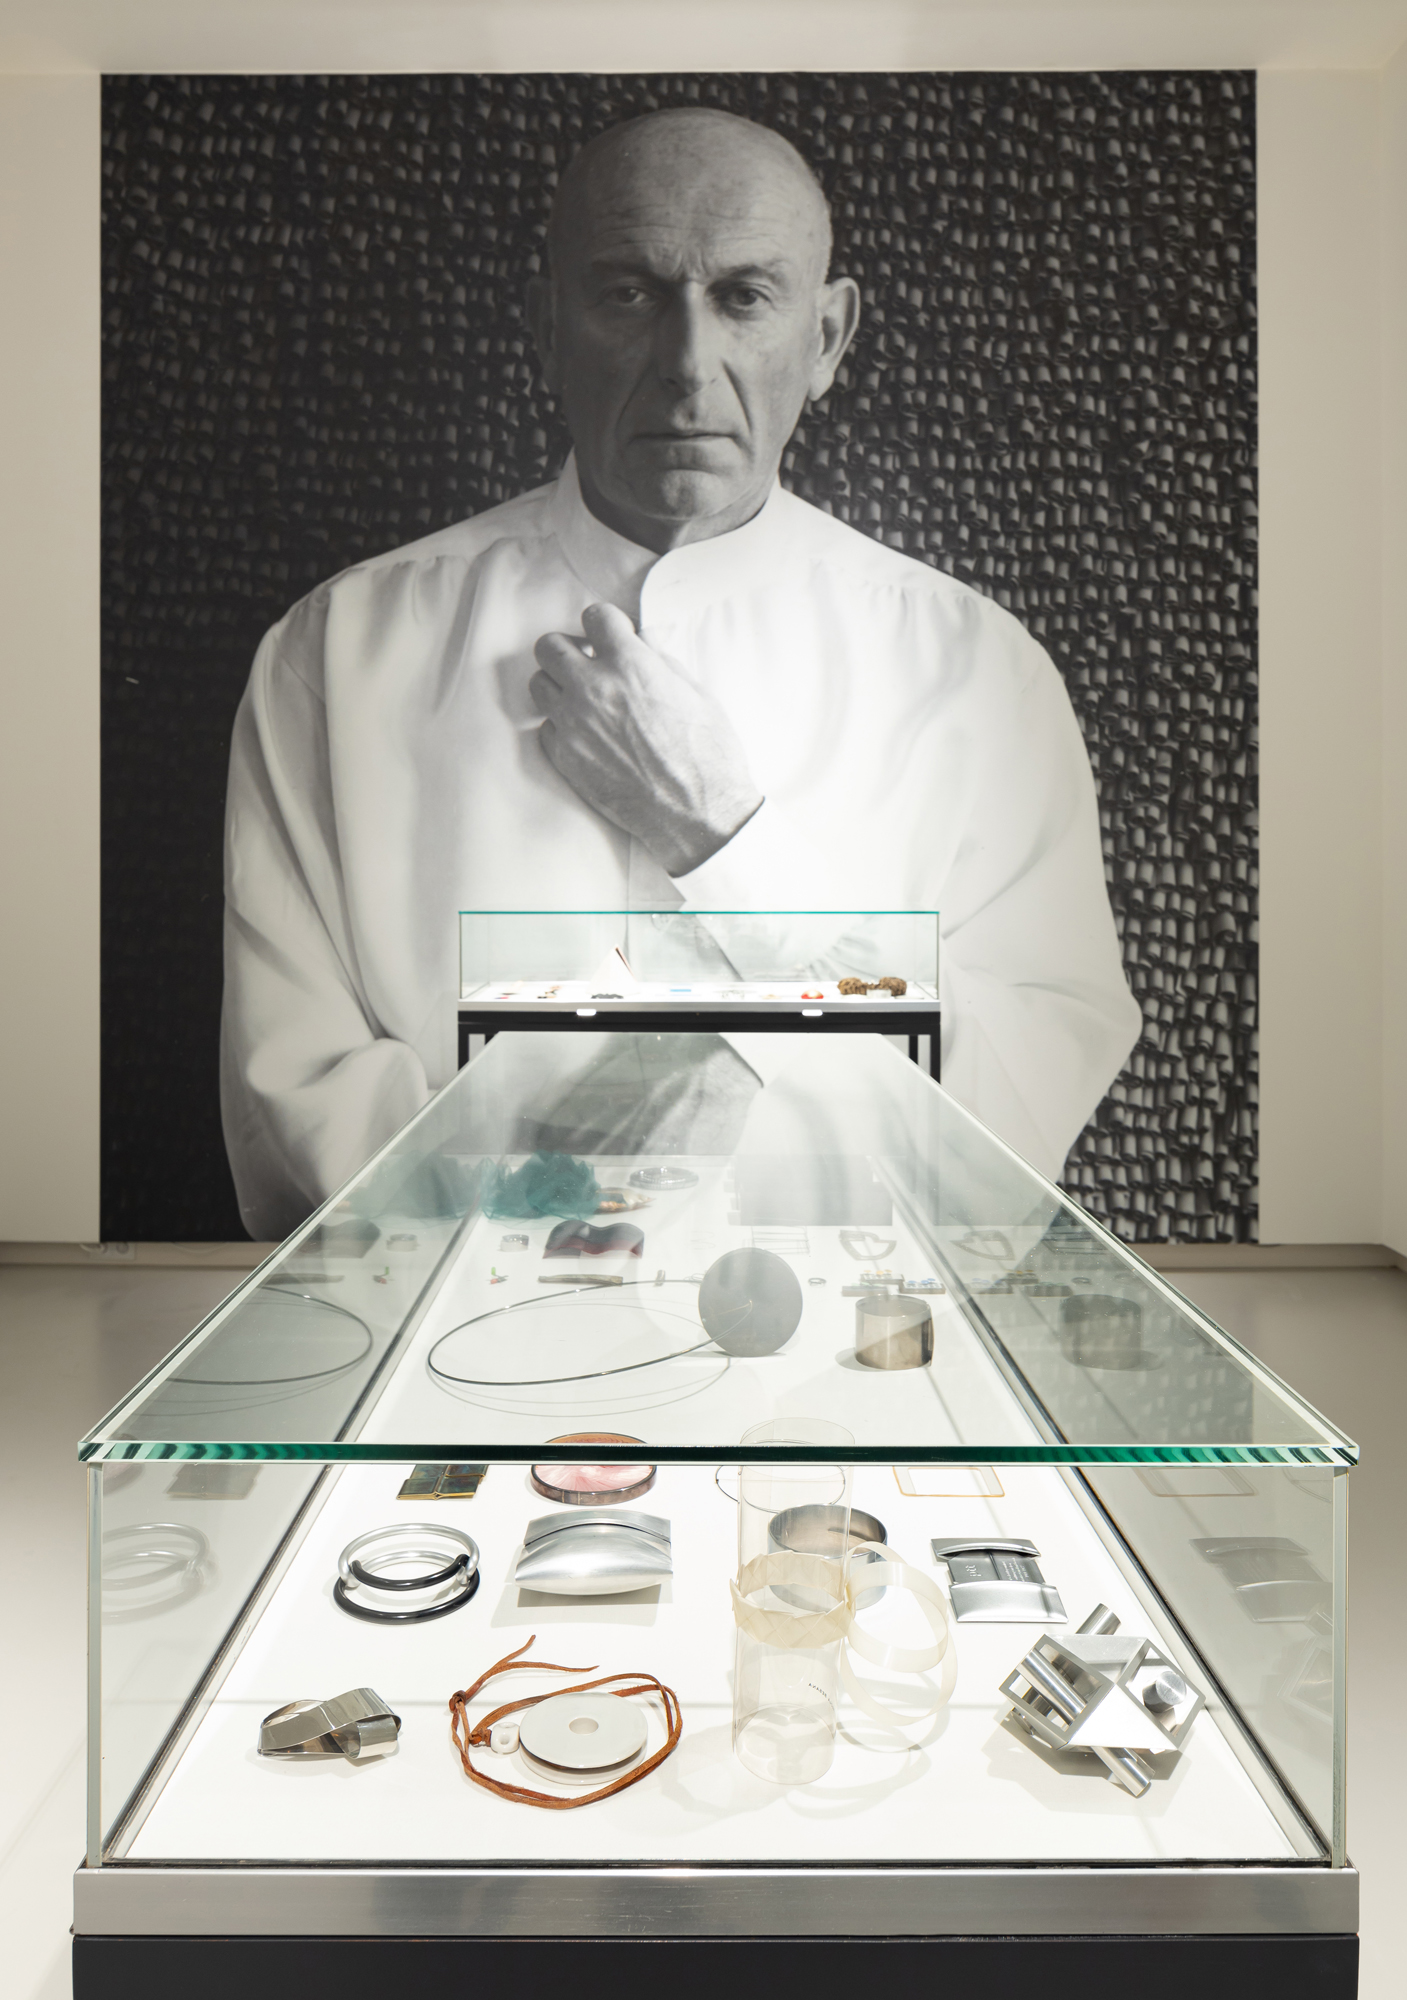 Benno Premsela - Strijder en verleider, Design Museum Den Bosch, 2021, vitrine, portret, Françoise van den Bosch, armband, aluminium